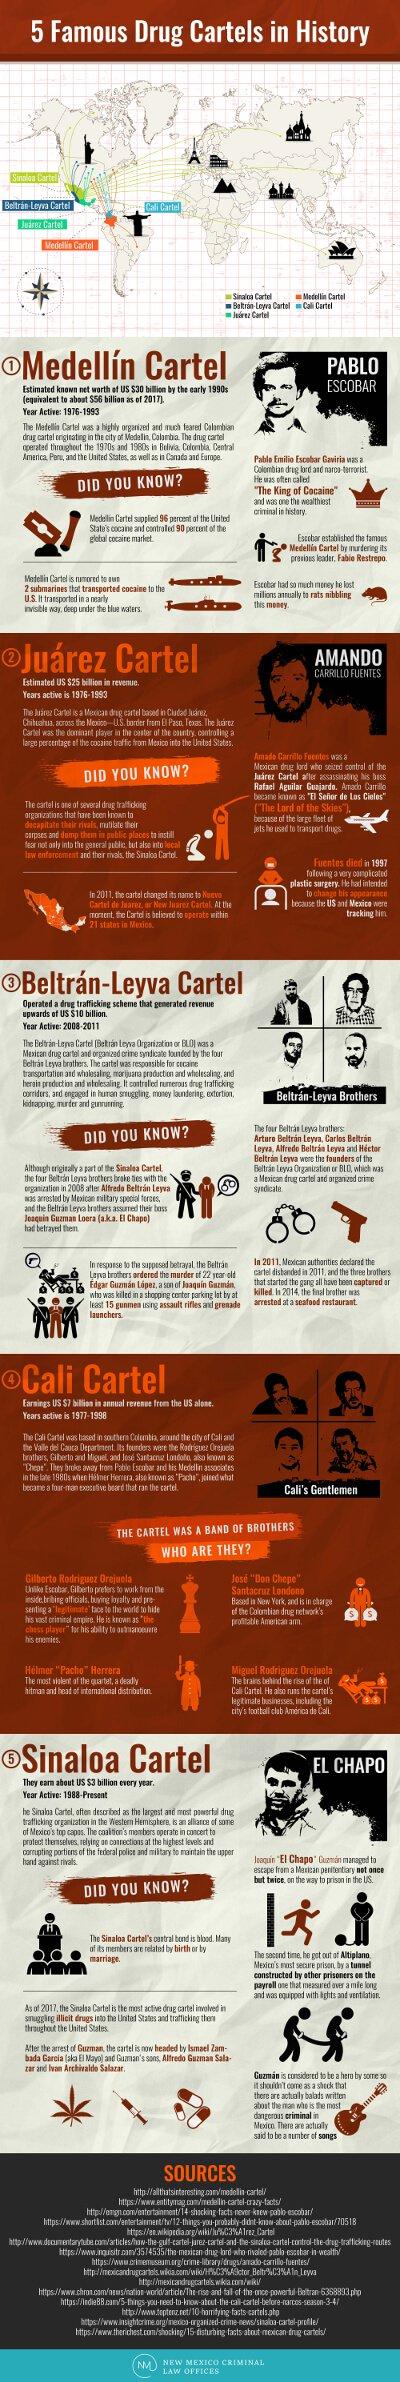 5-famous-drug-cartels-infographic-plaza